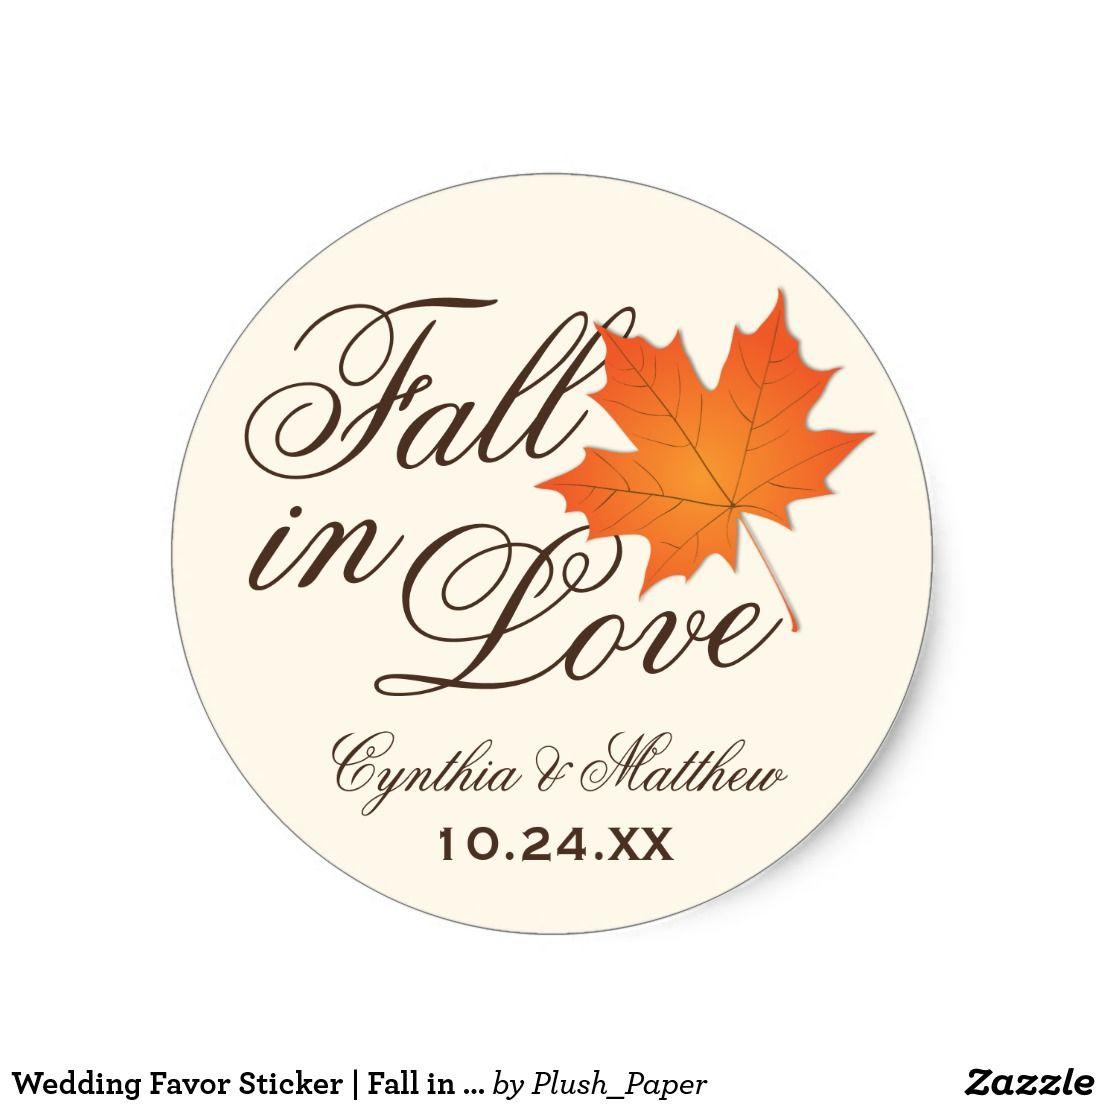 Wedding Favor Sticker | Fall in Love Theme | Themed weddings, Favors ...